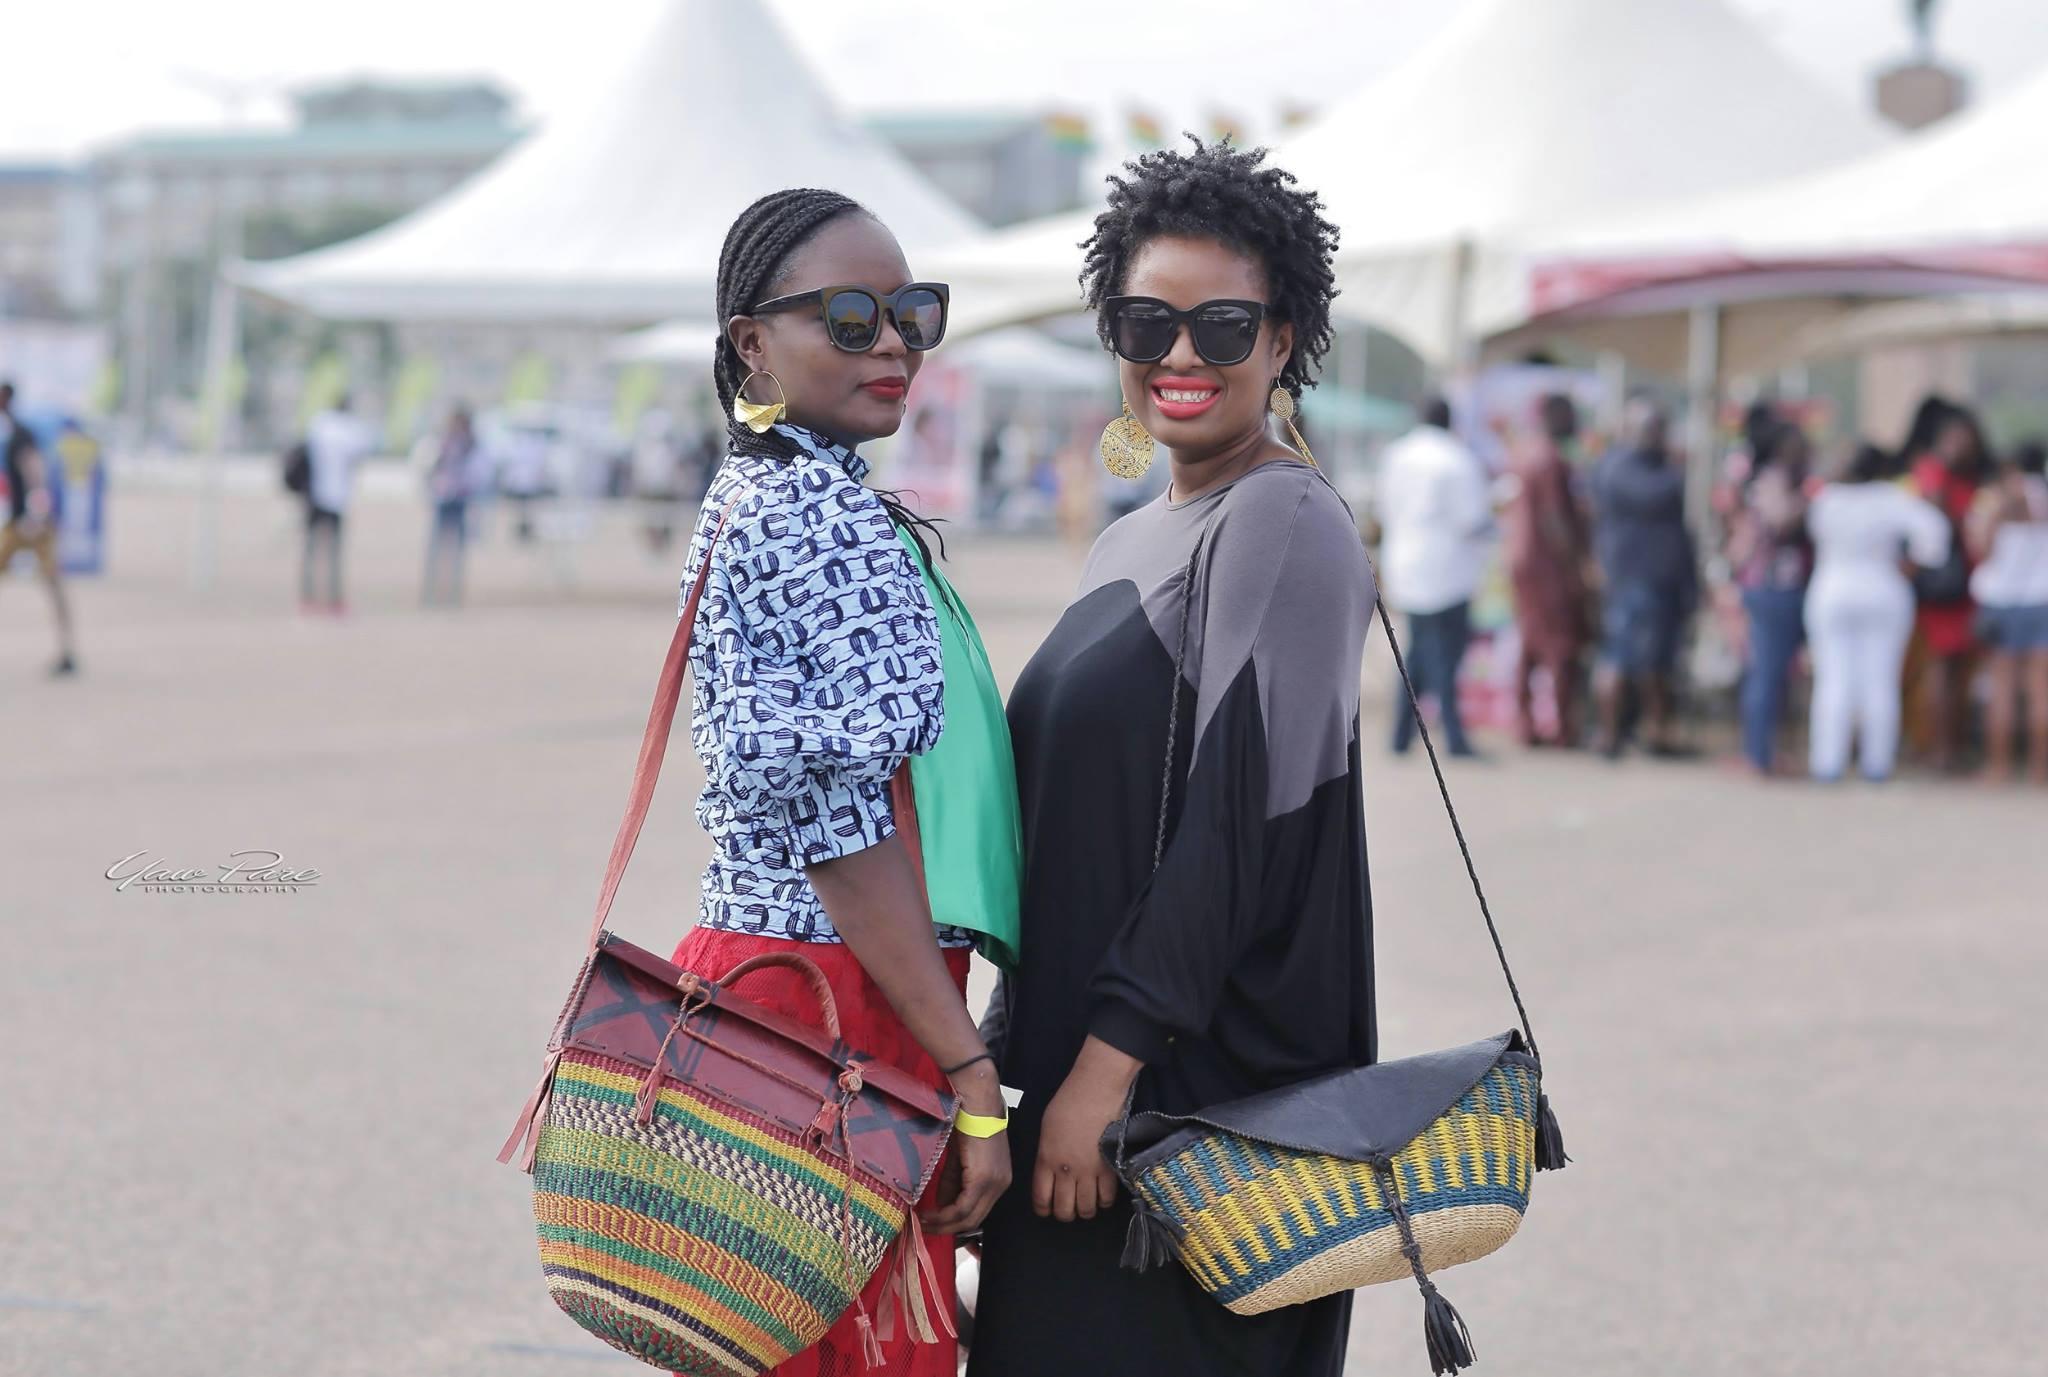 AccraFoodFestival17-Ghana-ChefBinta-VickieRemoe.jpg